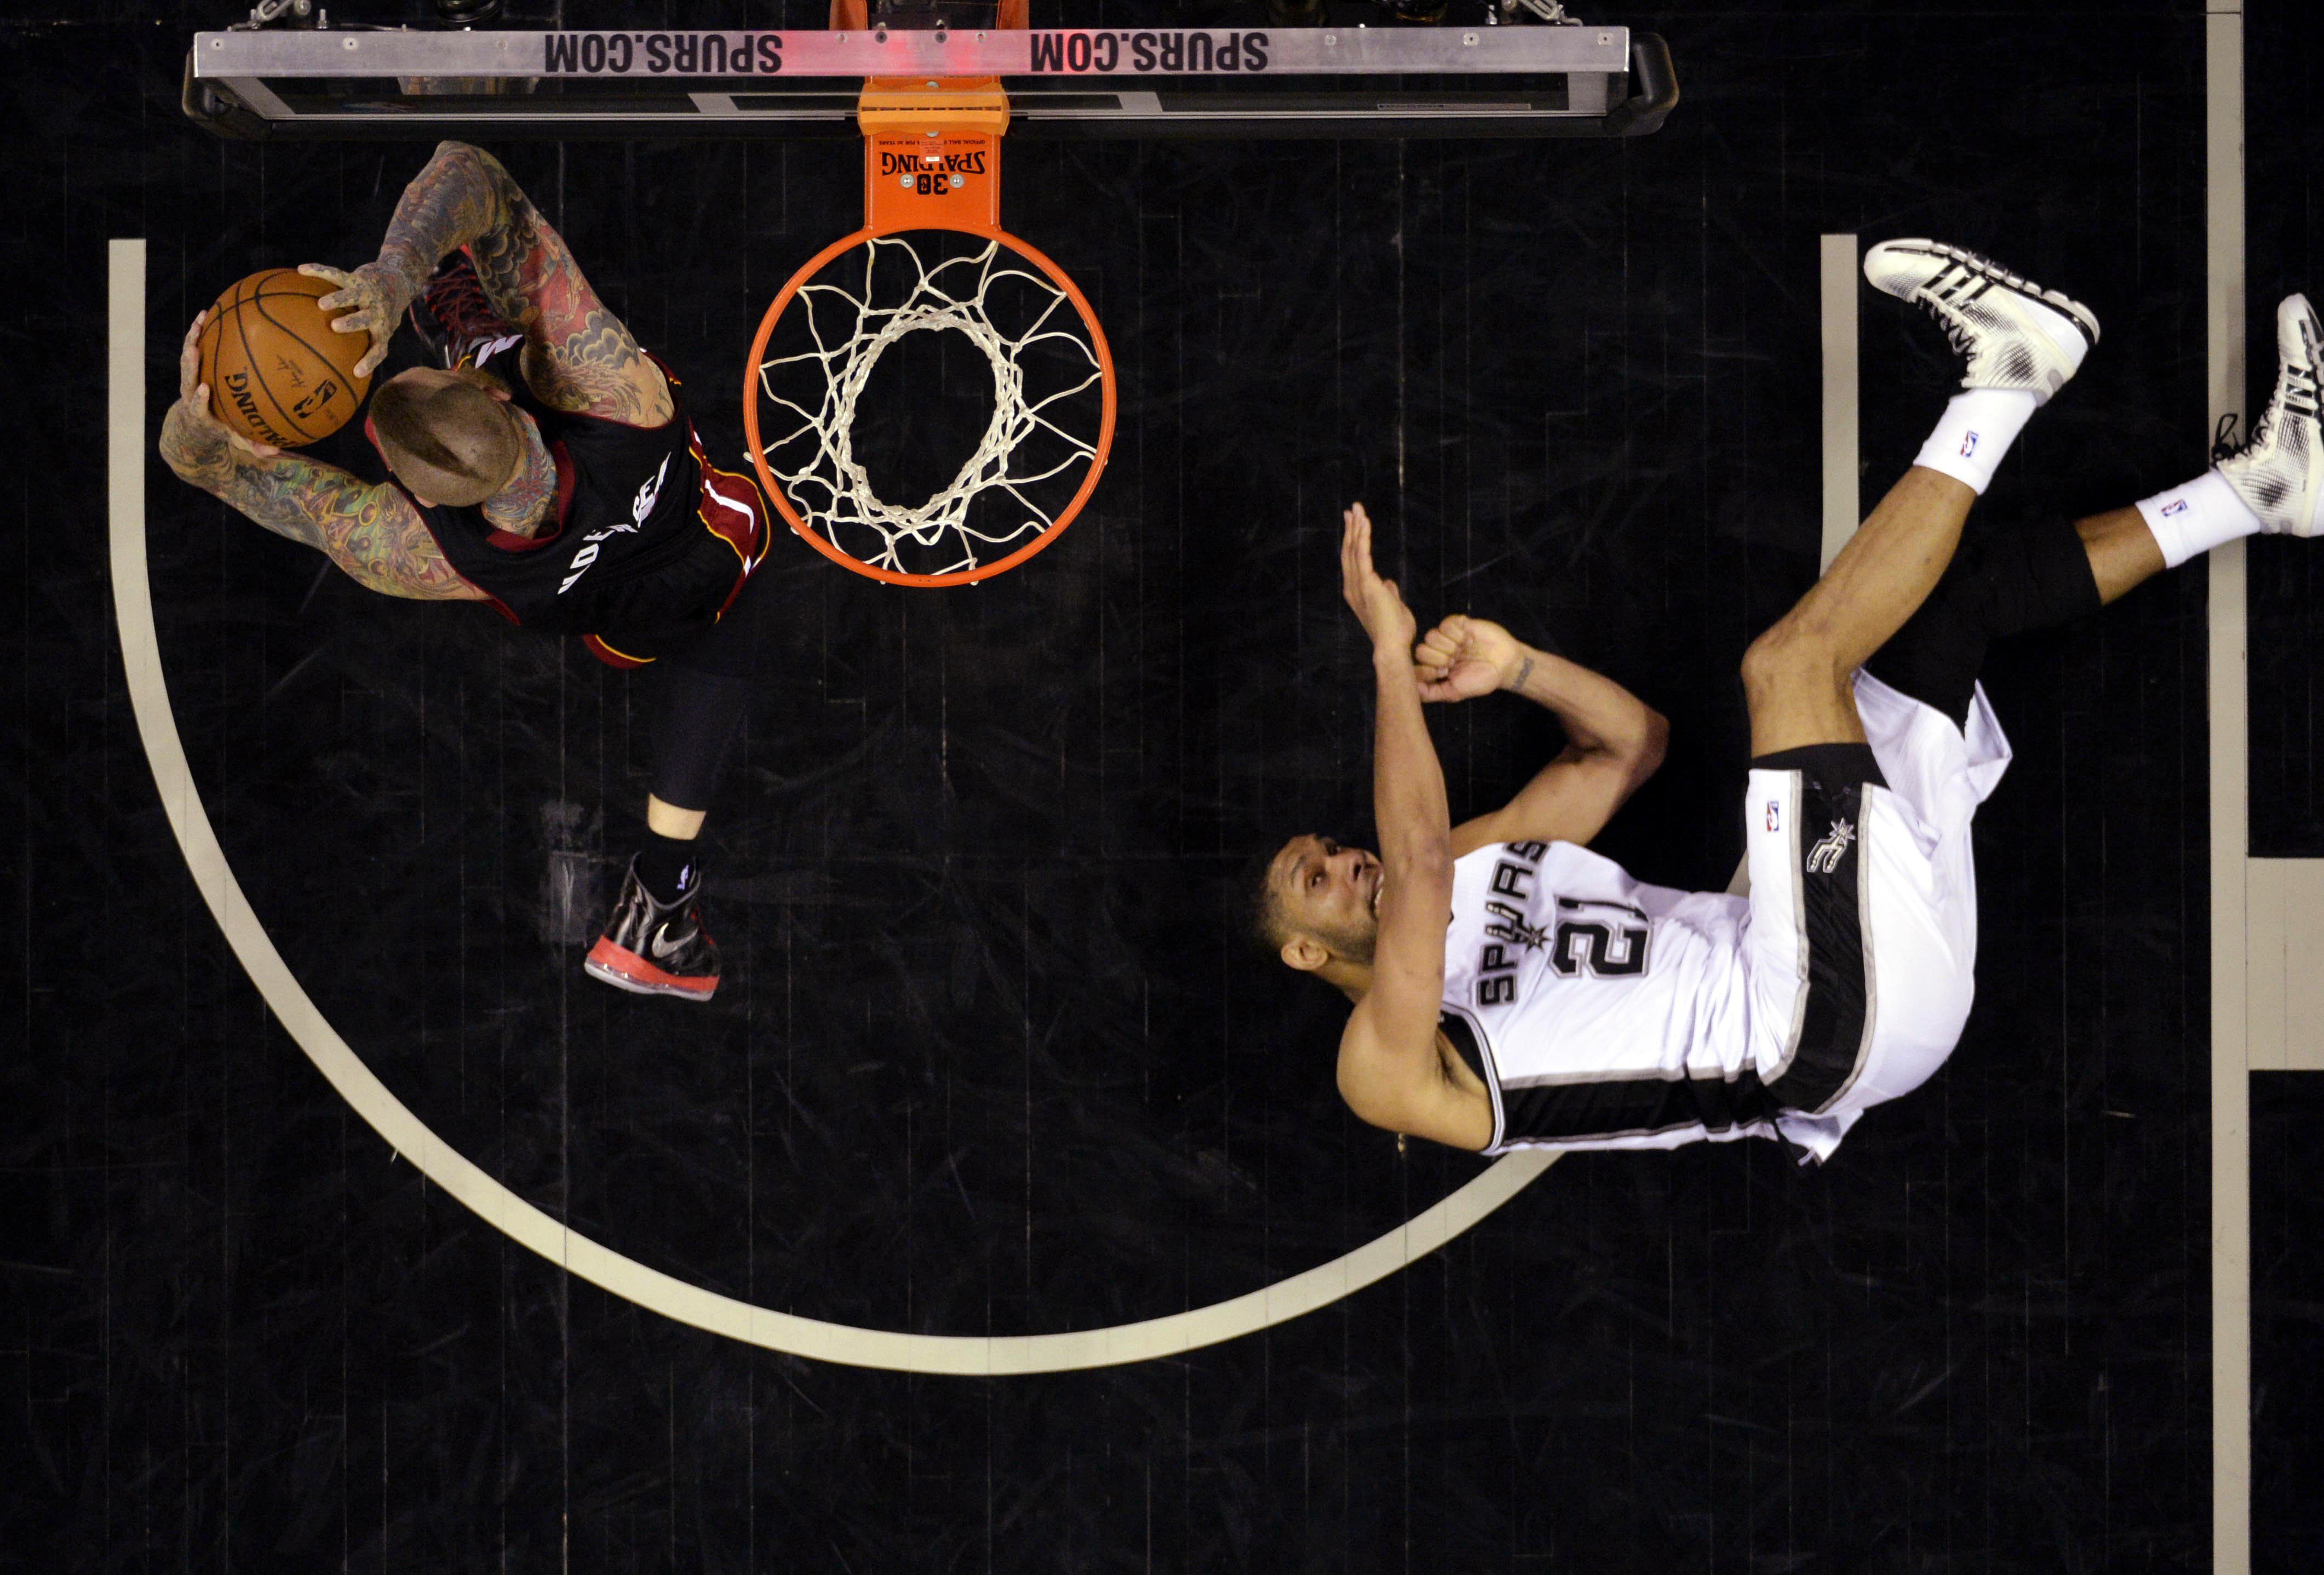 Miami Heat center Chris Andersen (11) grabs a rebound as San Antonio Spurs forward Tim Duncan (21) falls to the floor in Game 2 of the 2014 NBA Finals in San Antonio on June 8, 2014.